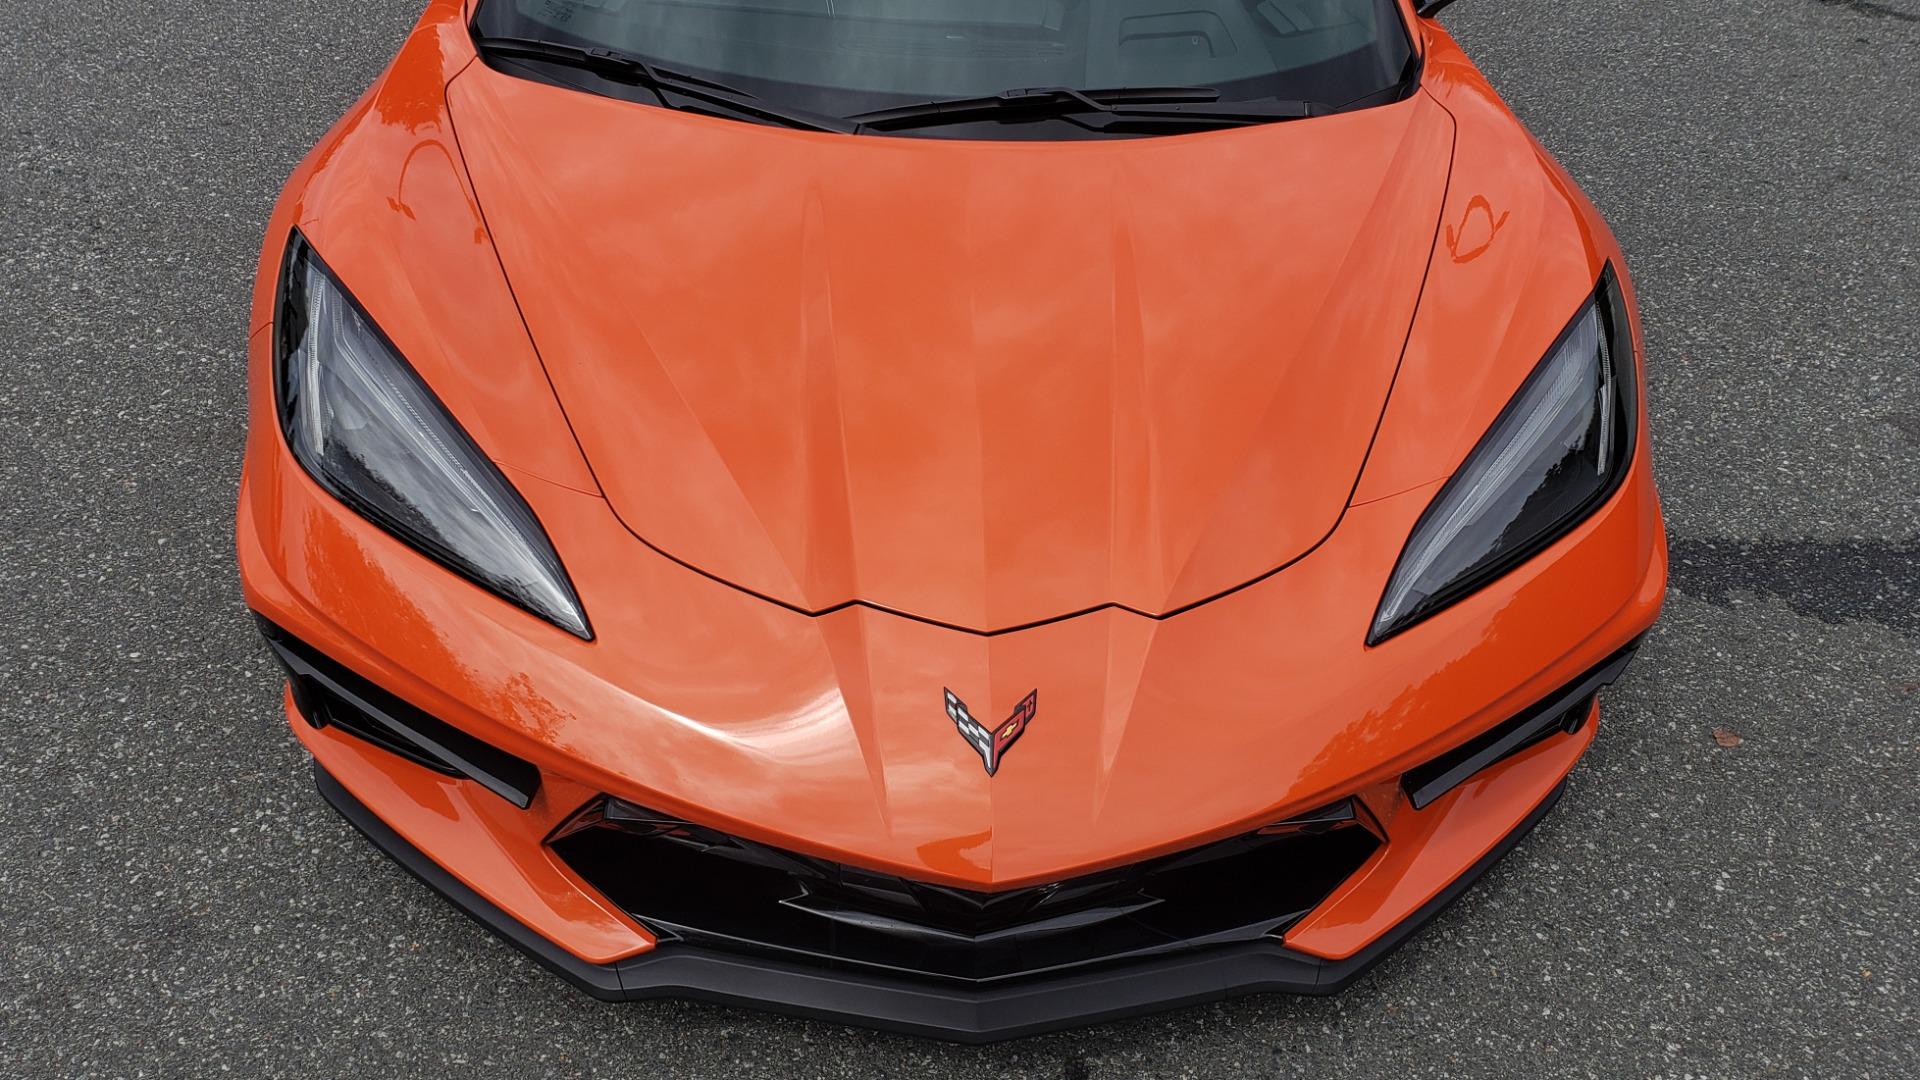 Used 2020 Chevrolet CORVETTE C8 STINGRAY 2LT / 6.2L V8 / 8-SPD AUTO / NAV / BOSE / REARVIEW / DATA RECOR for sale Sold at Formula Imports in Charlotte NC 28227 18